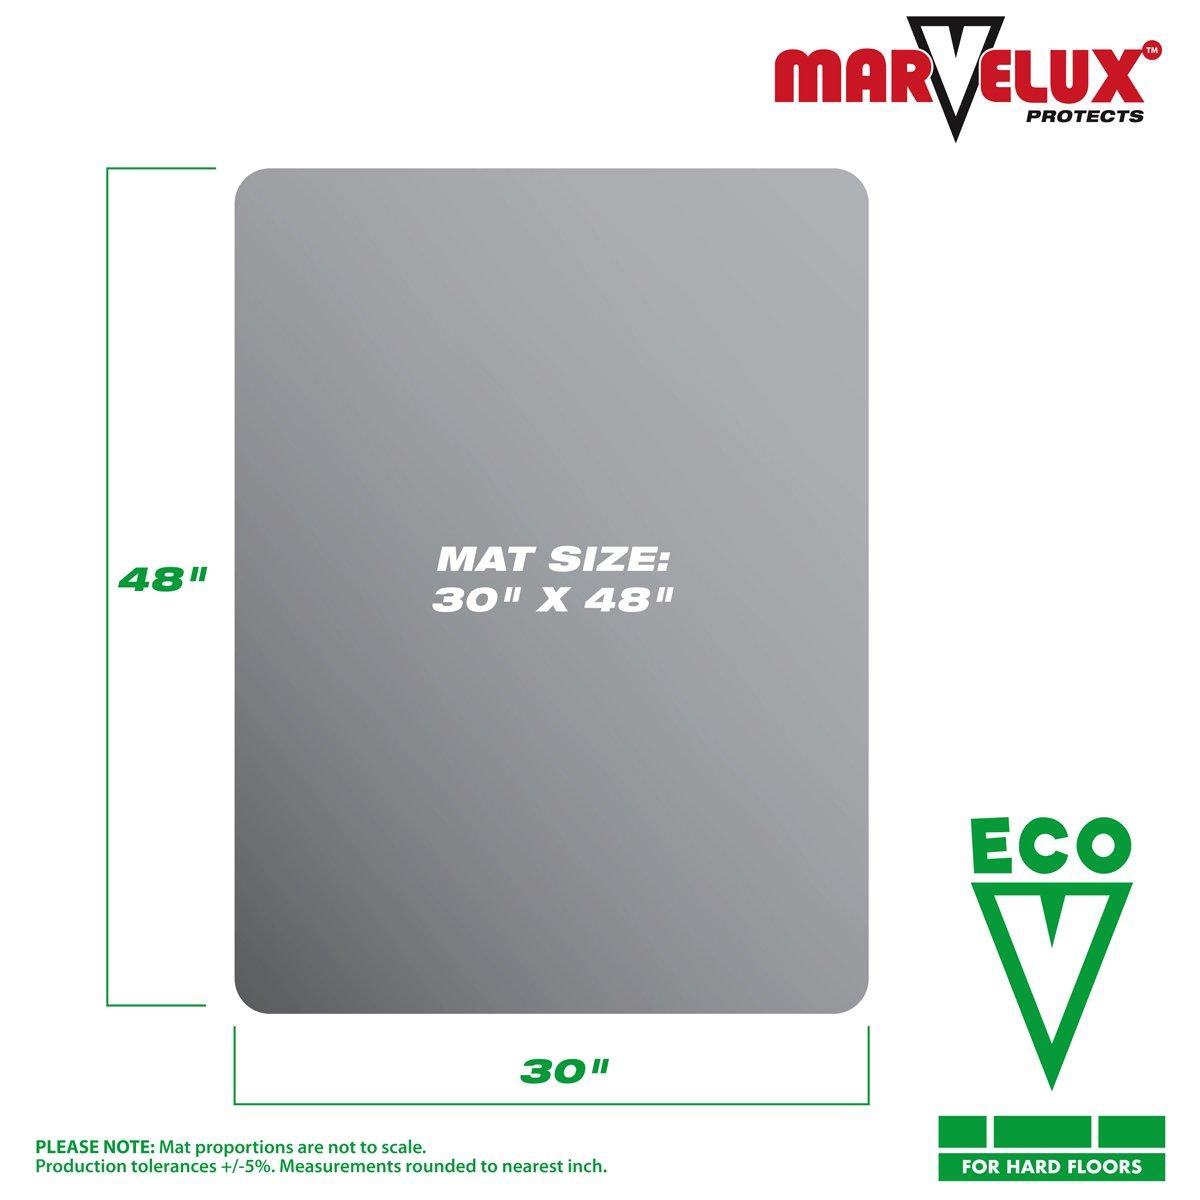 Marvelux 30 x 48 ECO Enhanced Polymer Rectangular Chair Mat for Hard Floors Transparent Hardwood Floor Protector Multiple Sizes